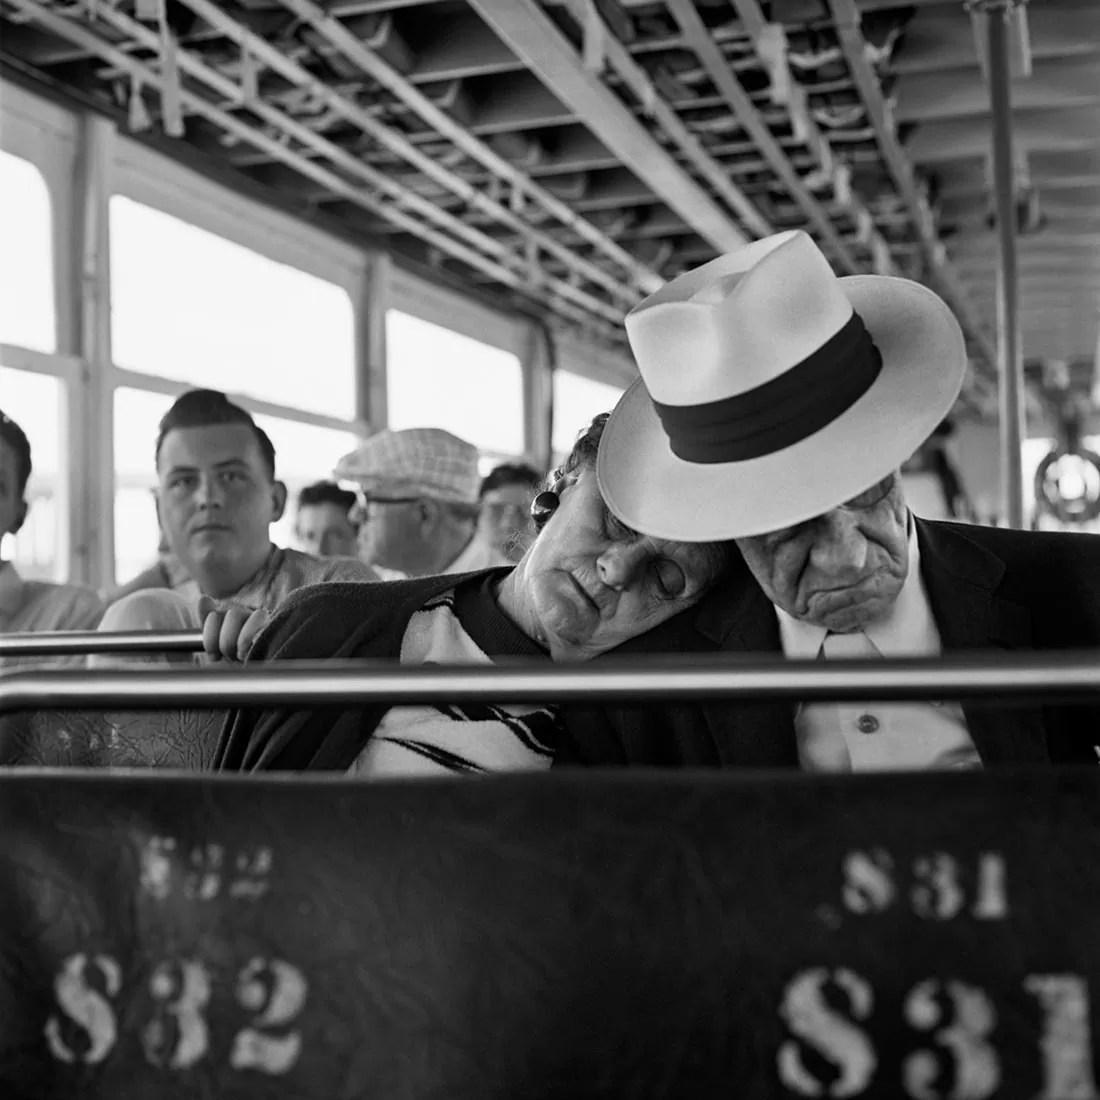 VM1960W03443 04 MC - Una storia Meravigliosa: Vivian Maier (Street Photography) - fotostreet.it